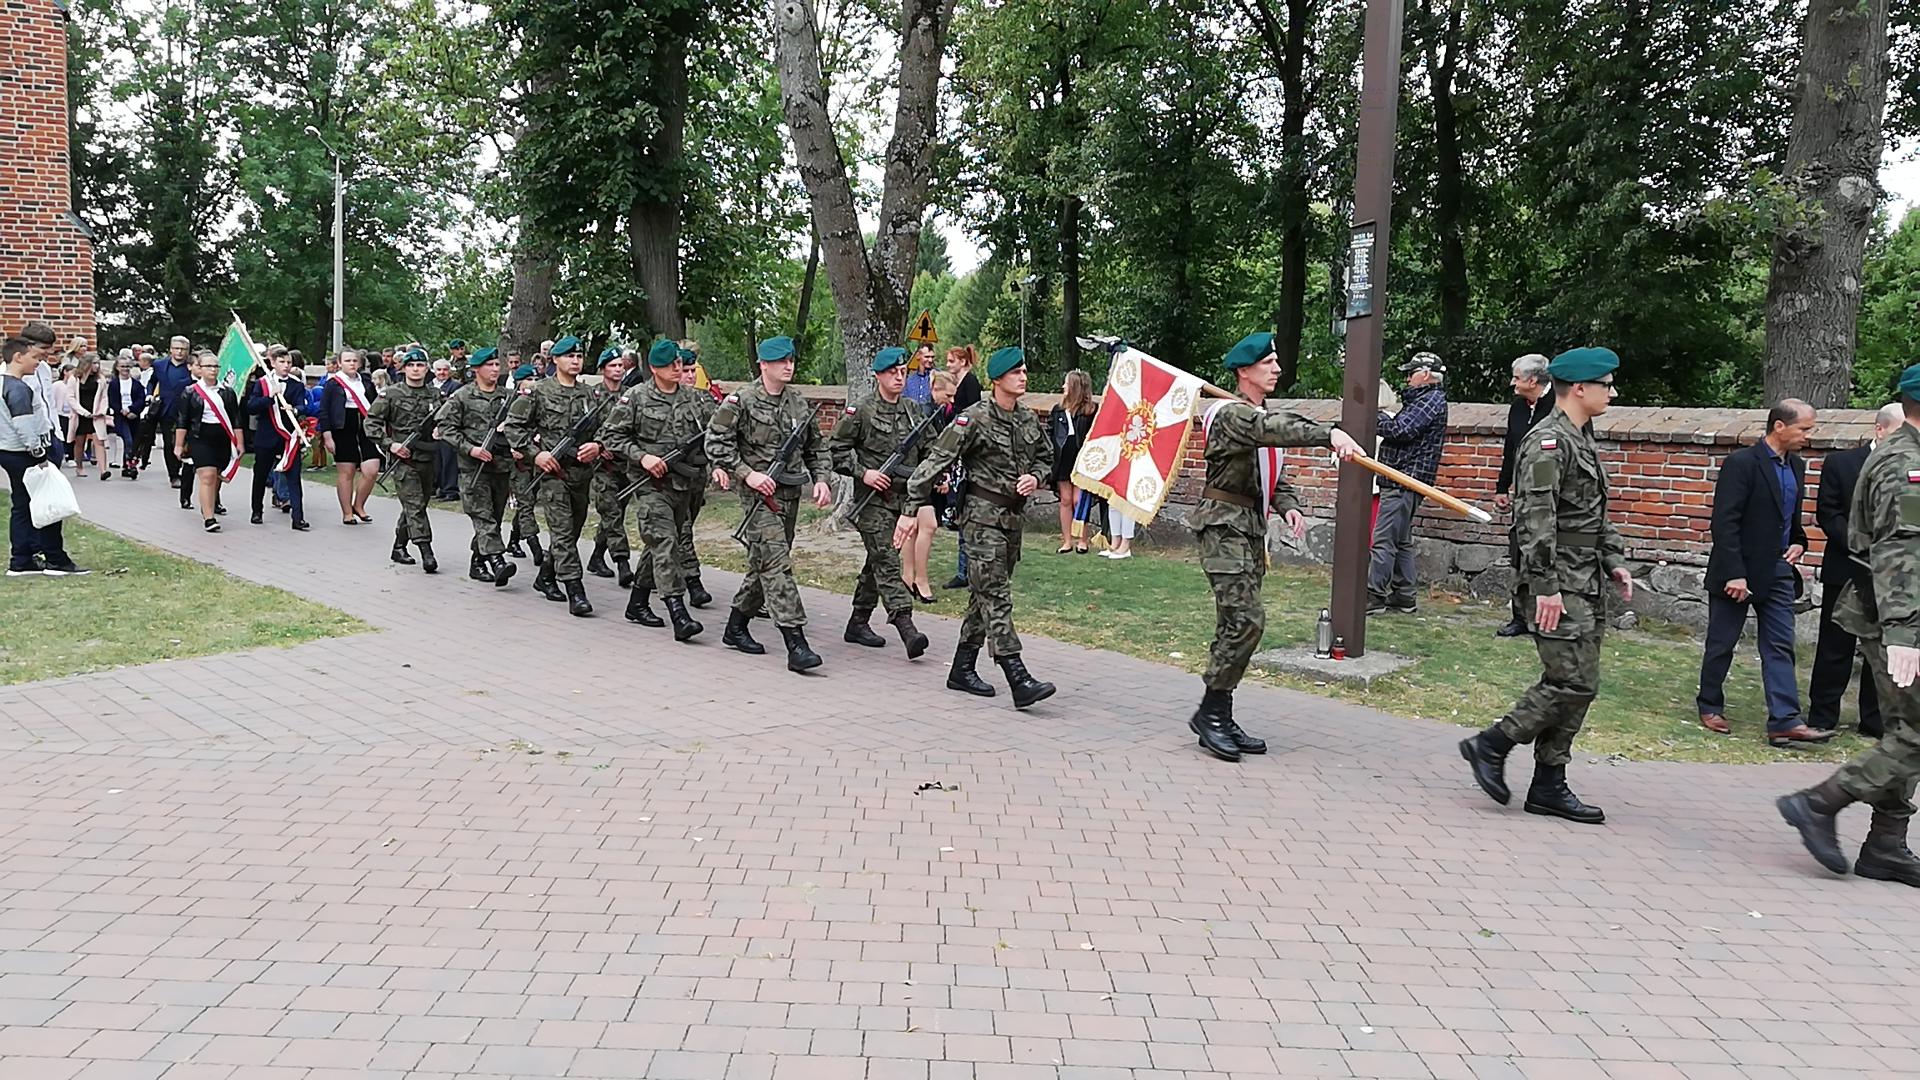 Kompania wojskowa